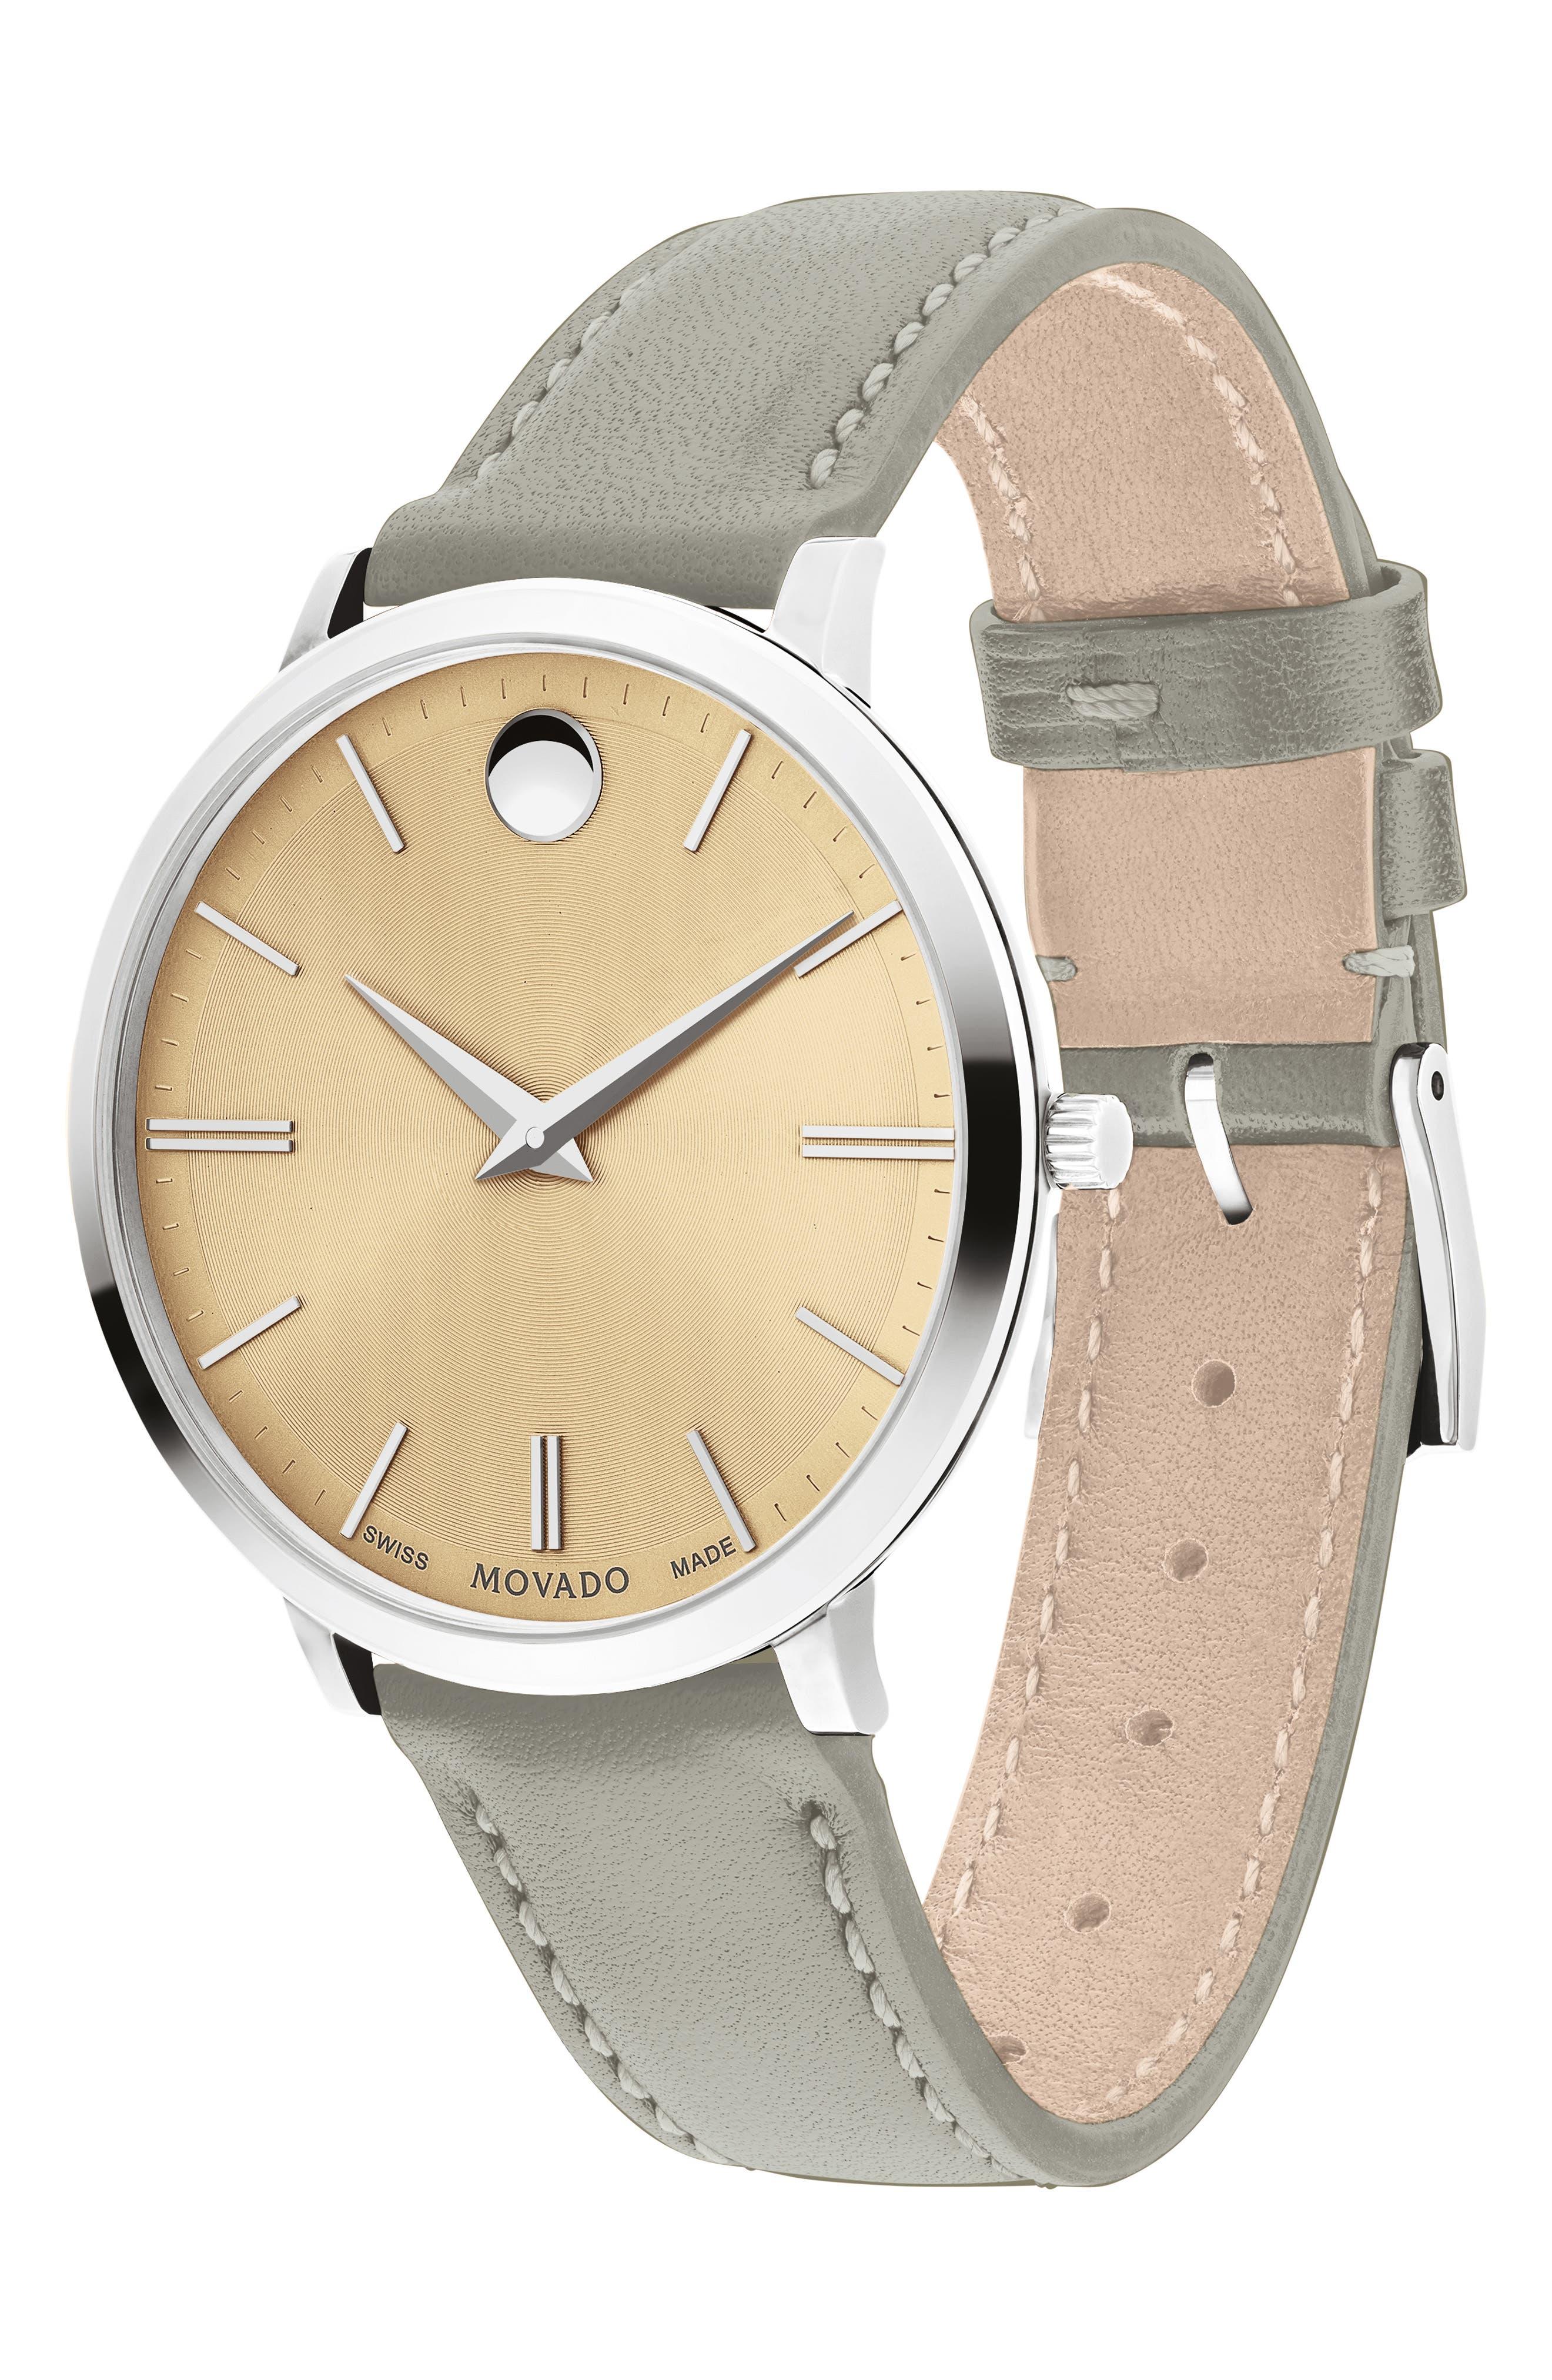 MOVADO, Ultraslim Leather Strap Watch, 35mm, Alternate thumbnail 3, color, GREY/ BEIGE/ SILVER